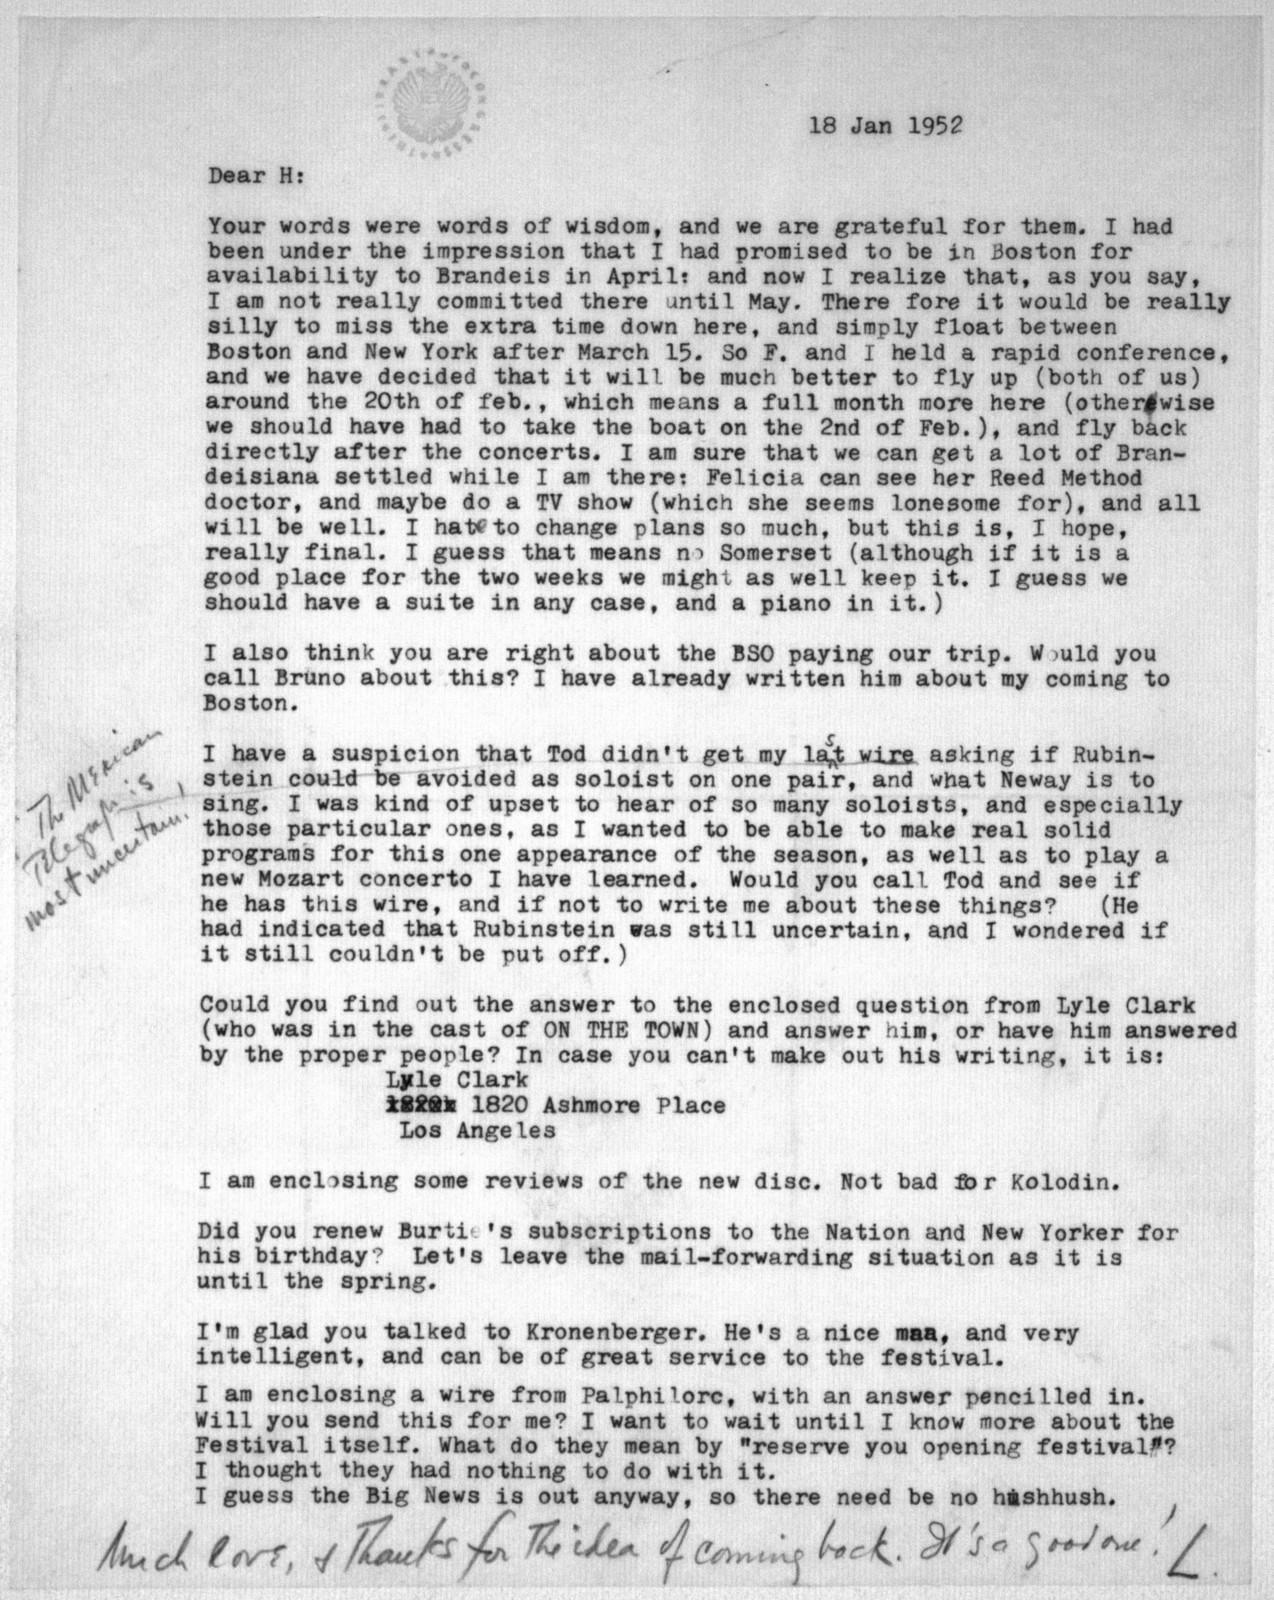 Letter from Leonard Bernstein to Helen Coates, January 18, 1952